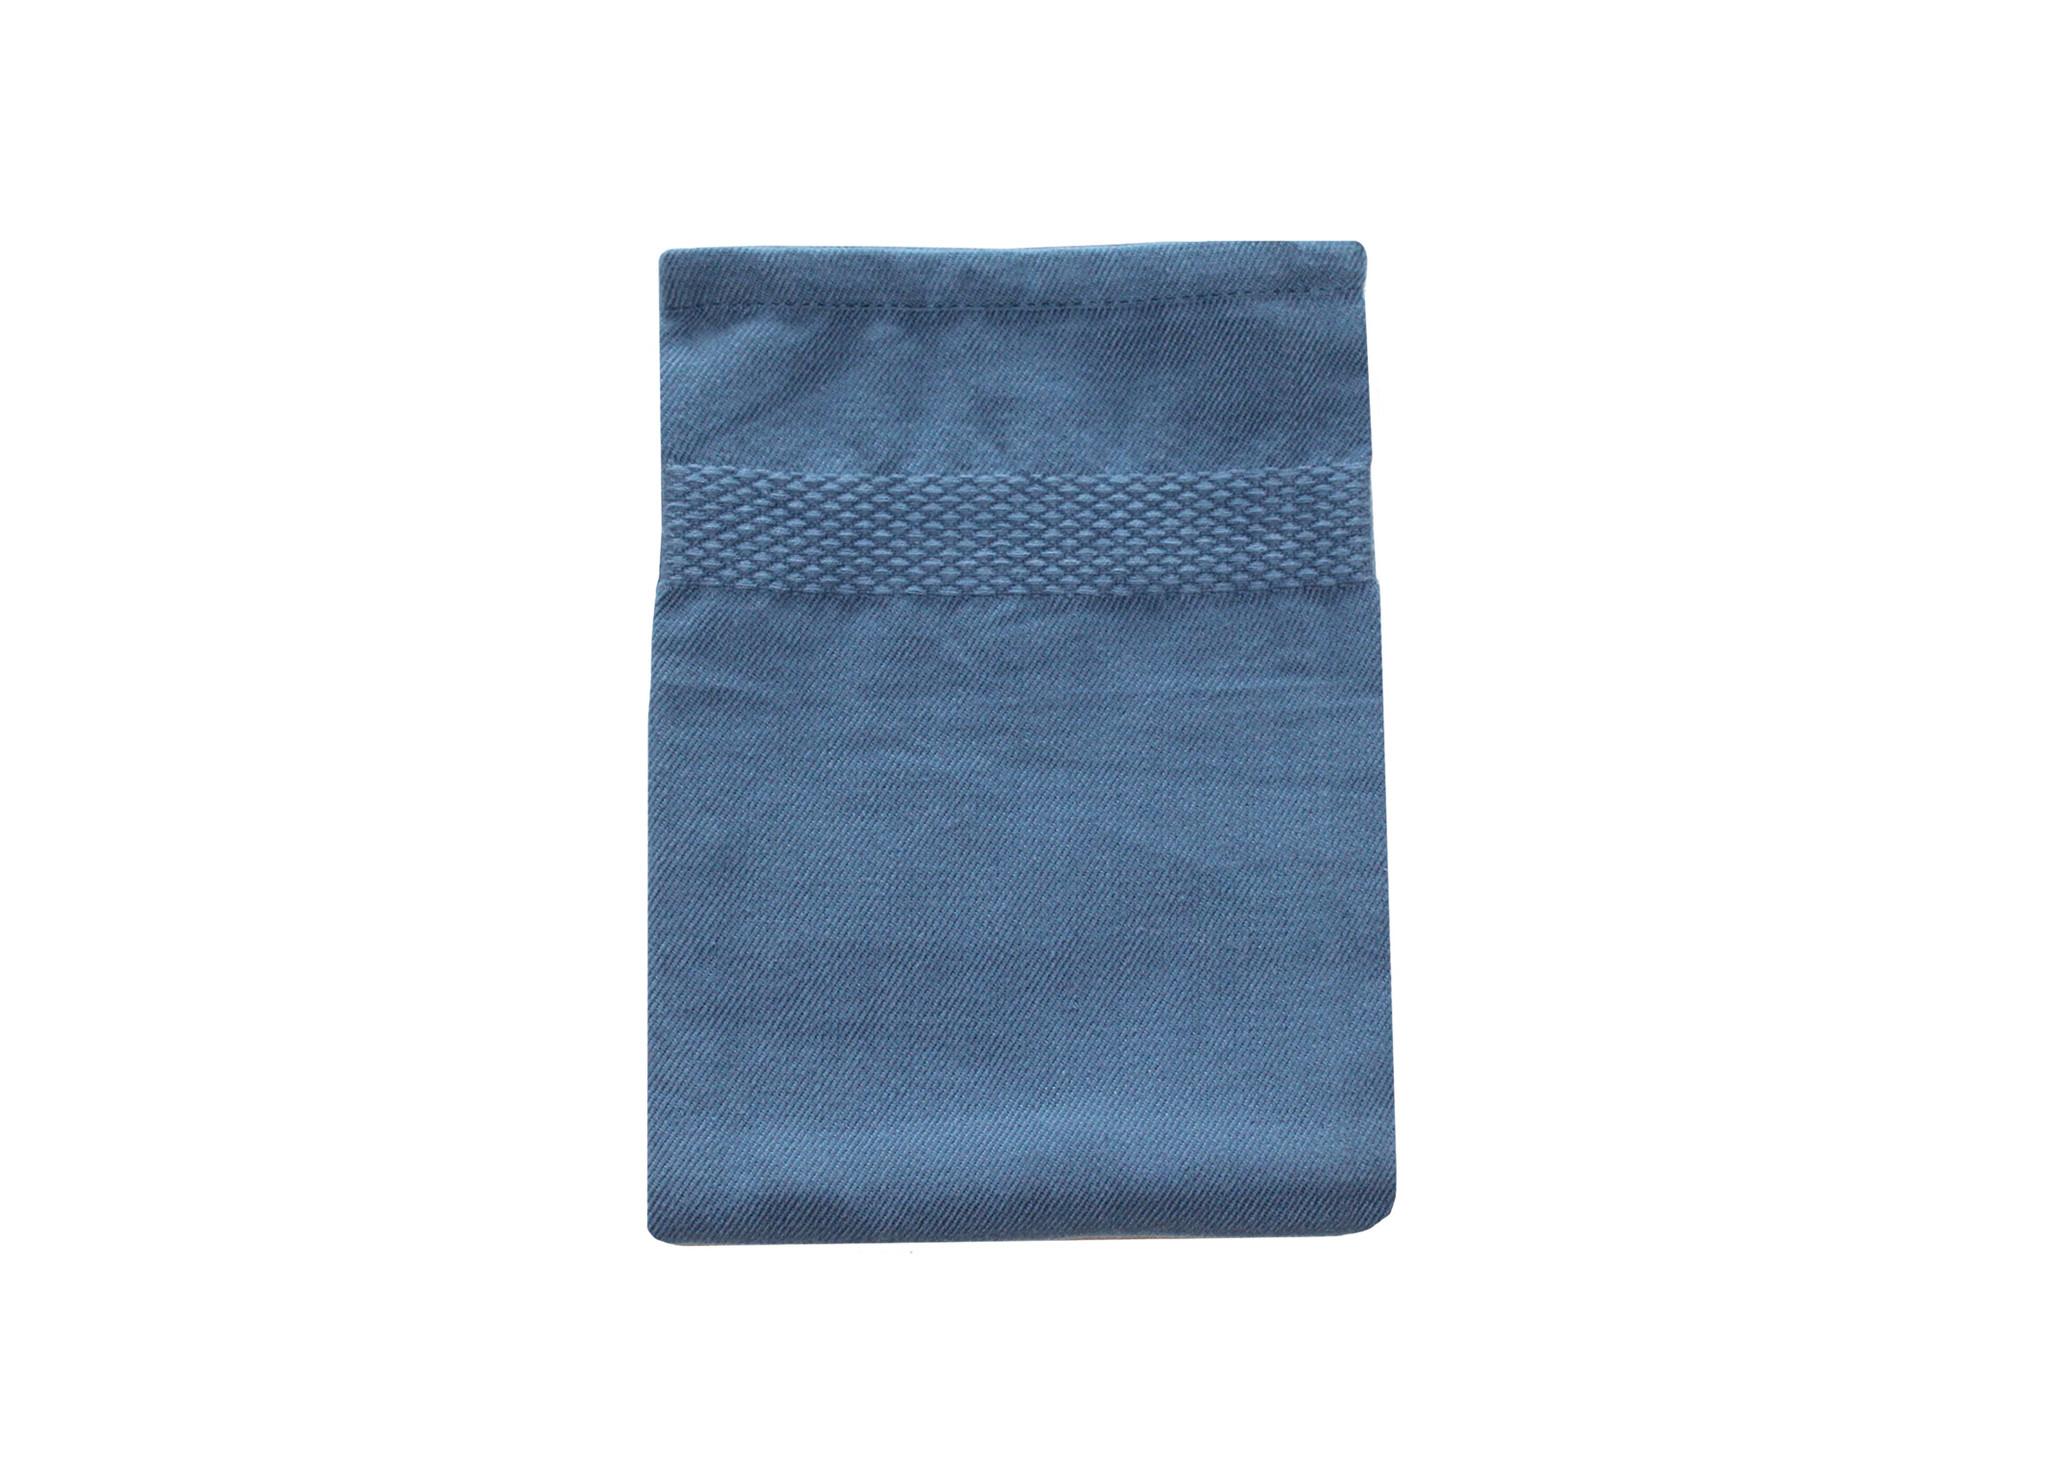 EM Kitchen Theedoek Jeans Blauw